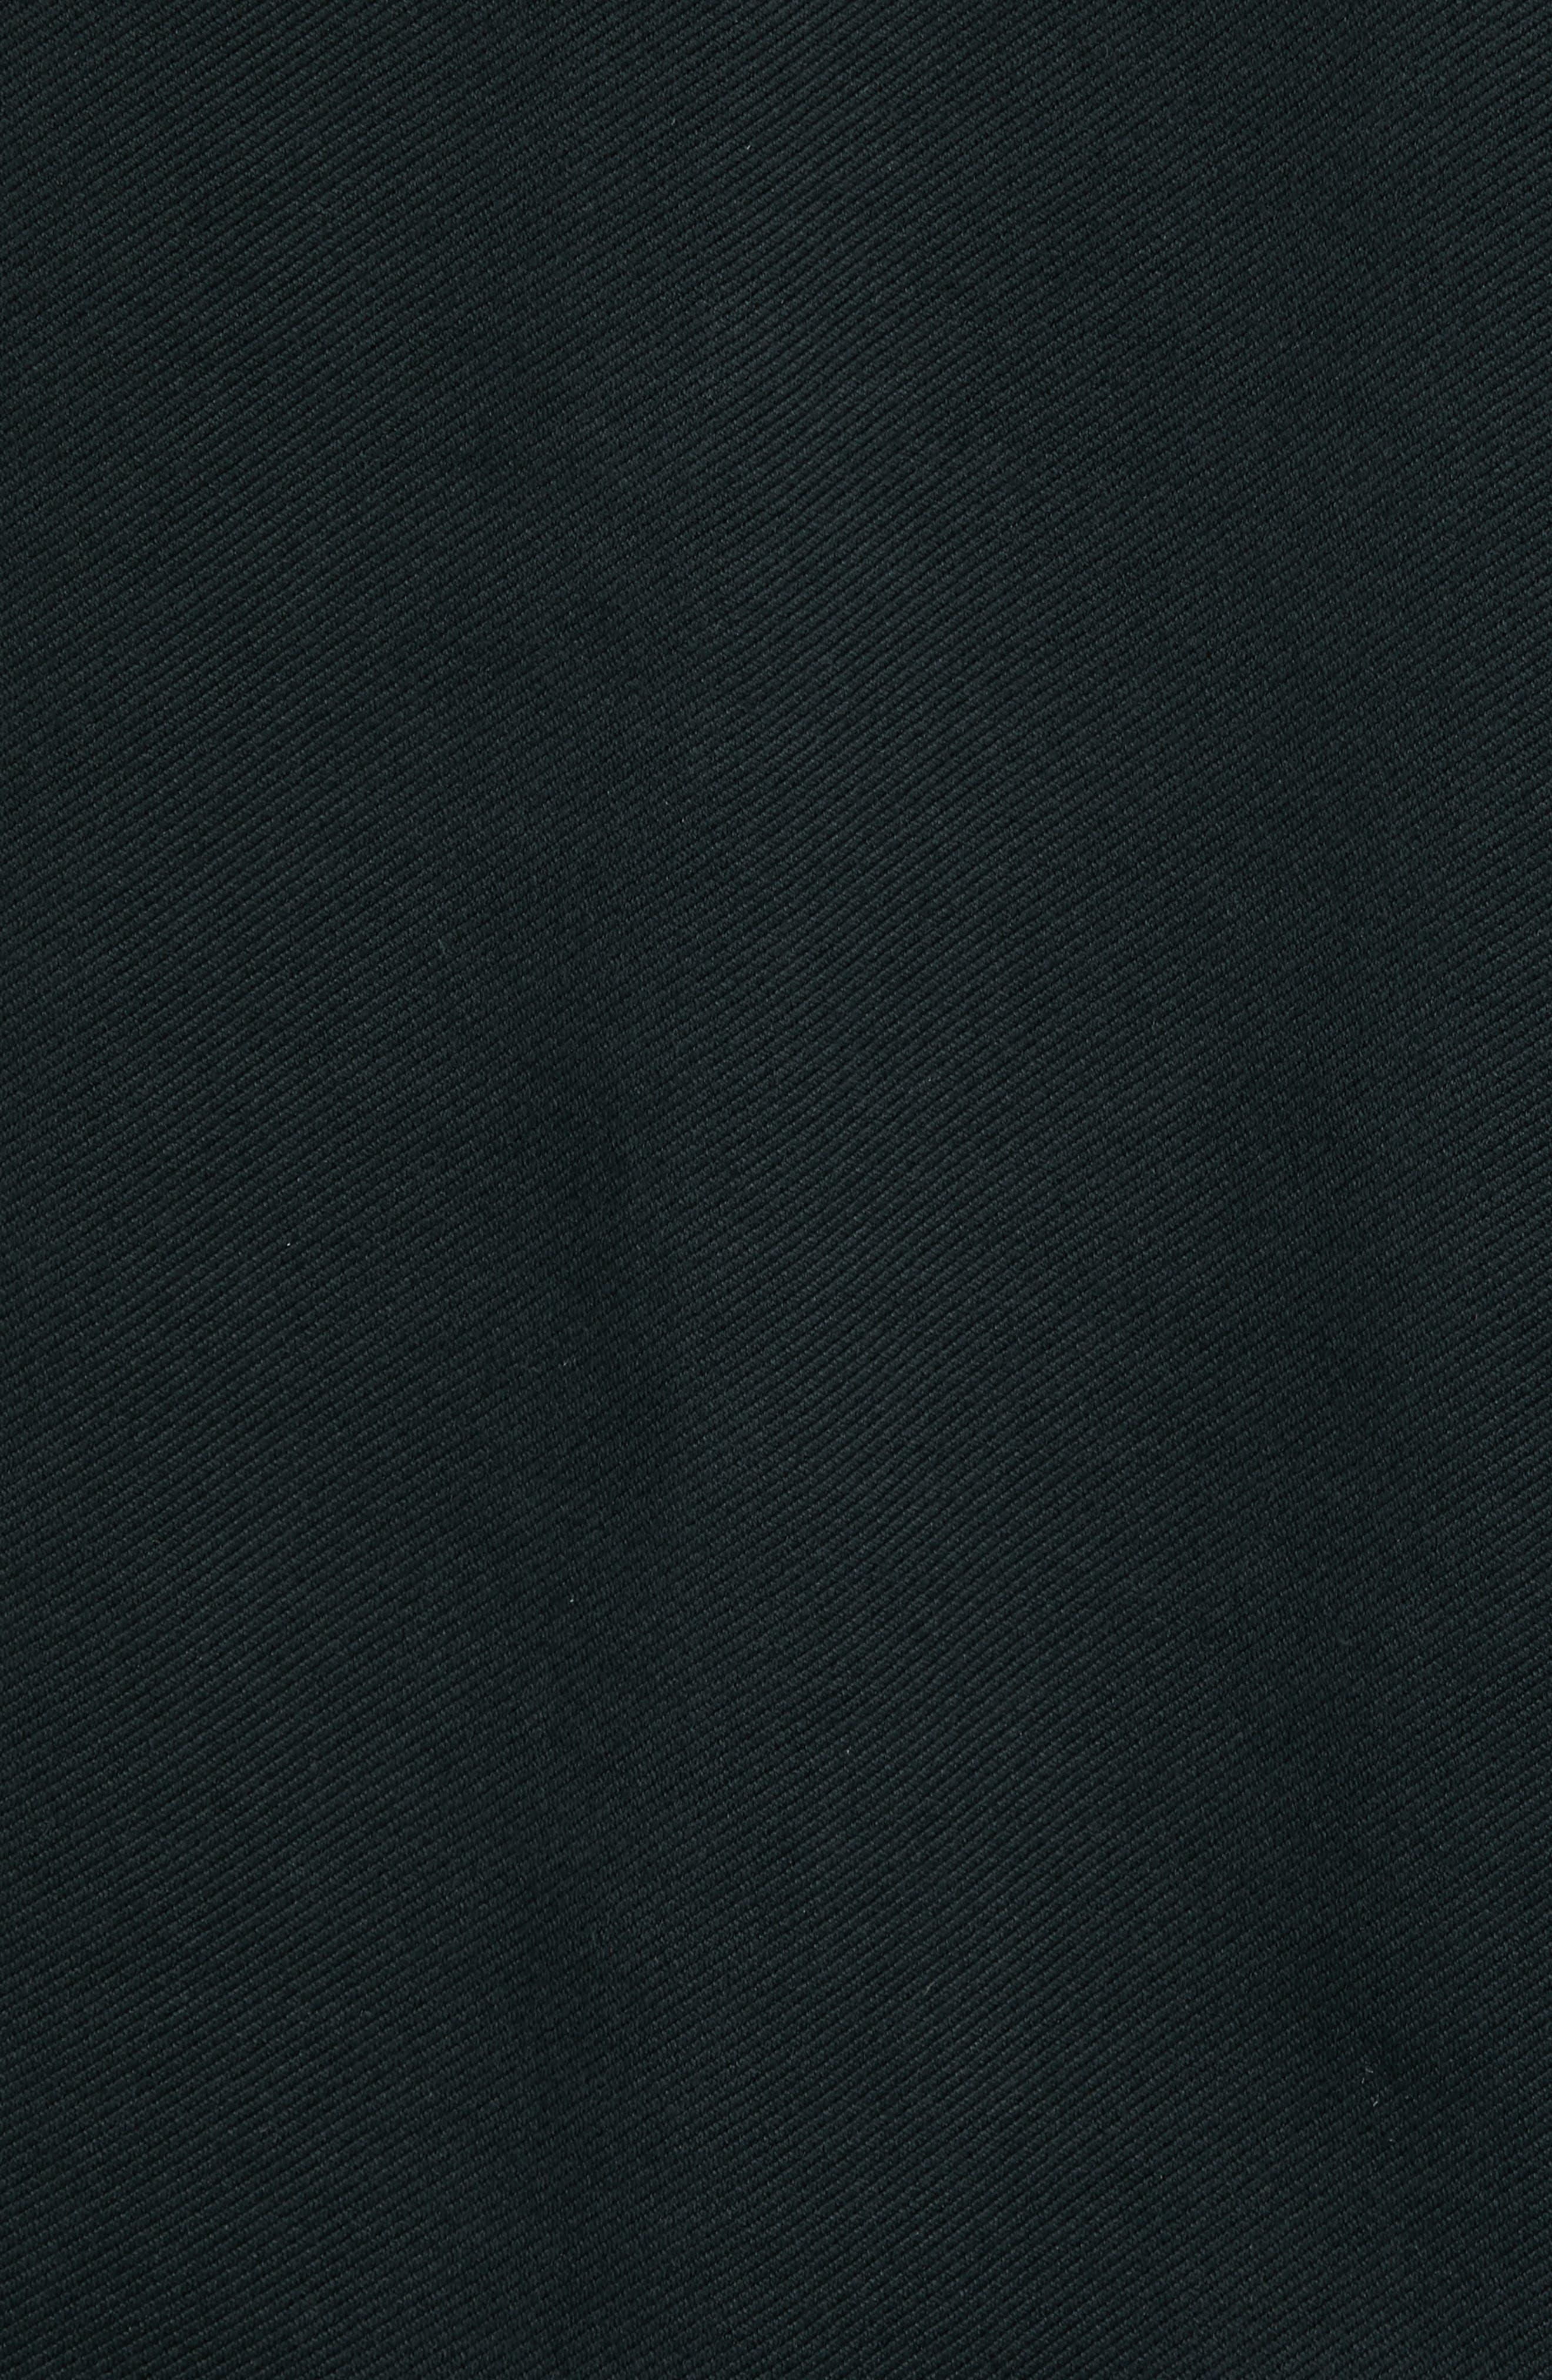 Danett Tall Twill Jacket,                             Alternate thumbnail 6, color,                             BLACK